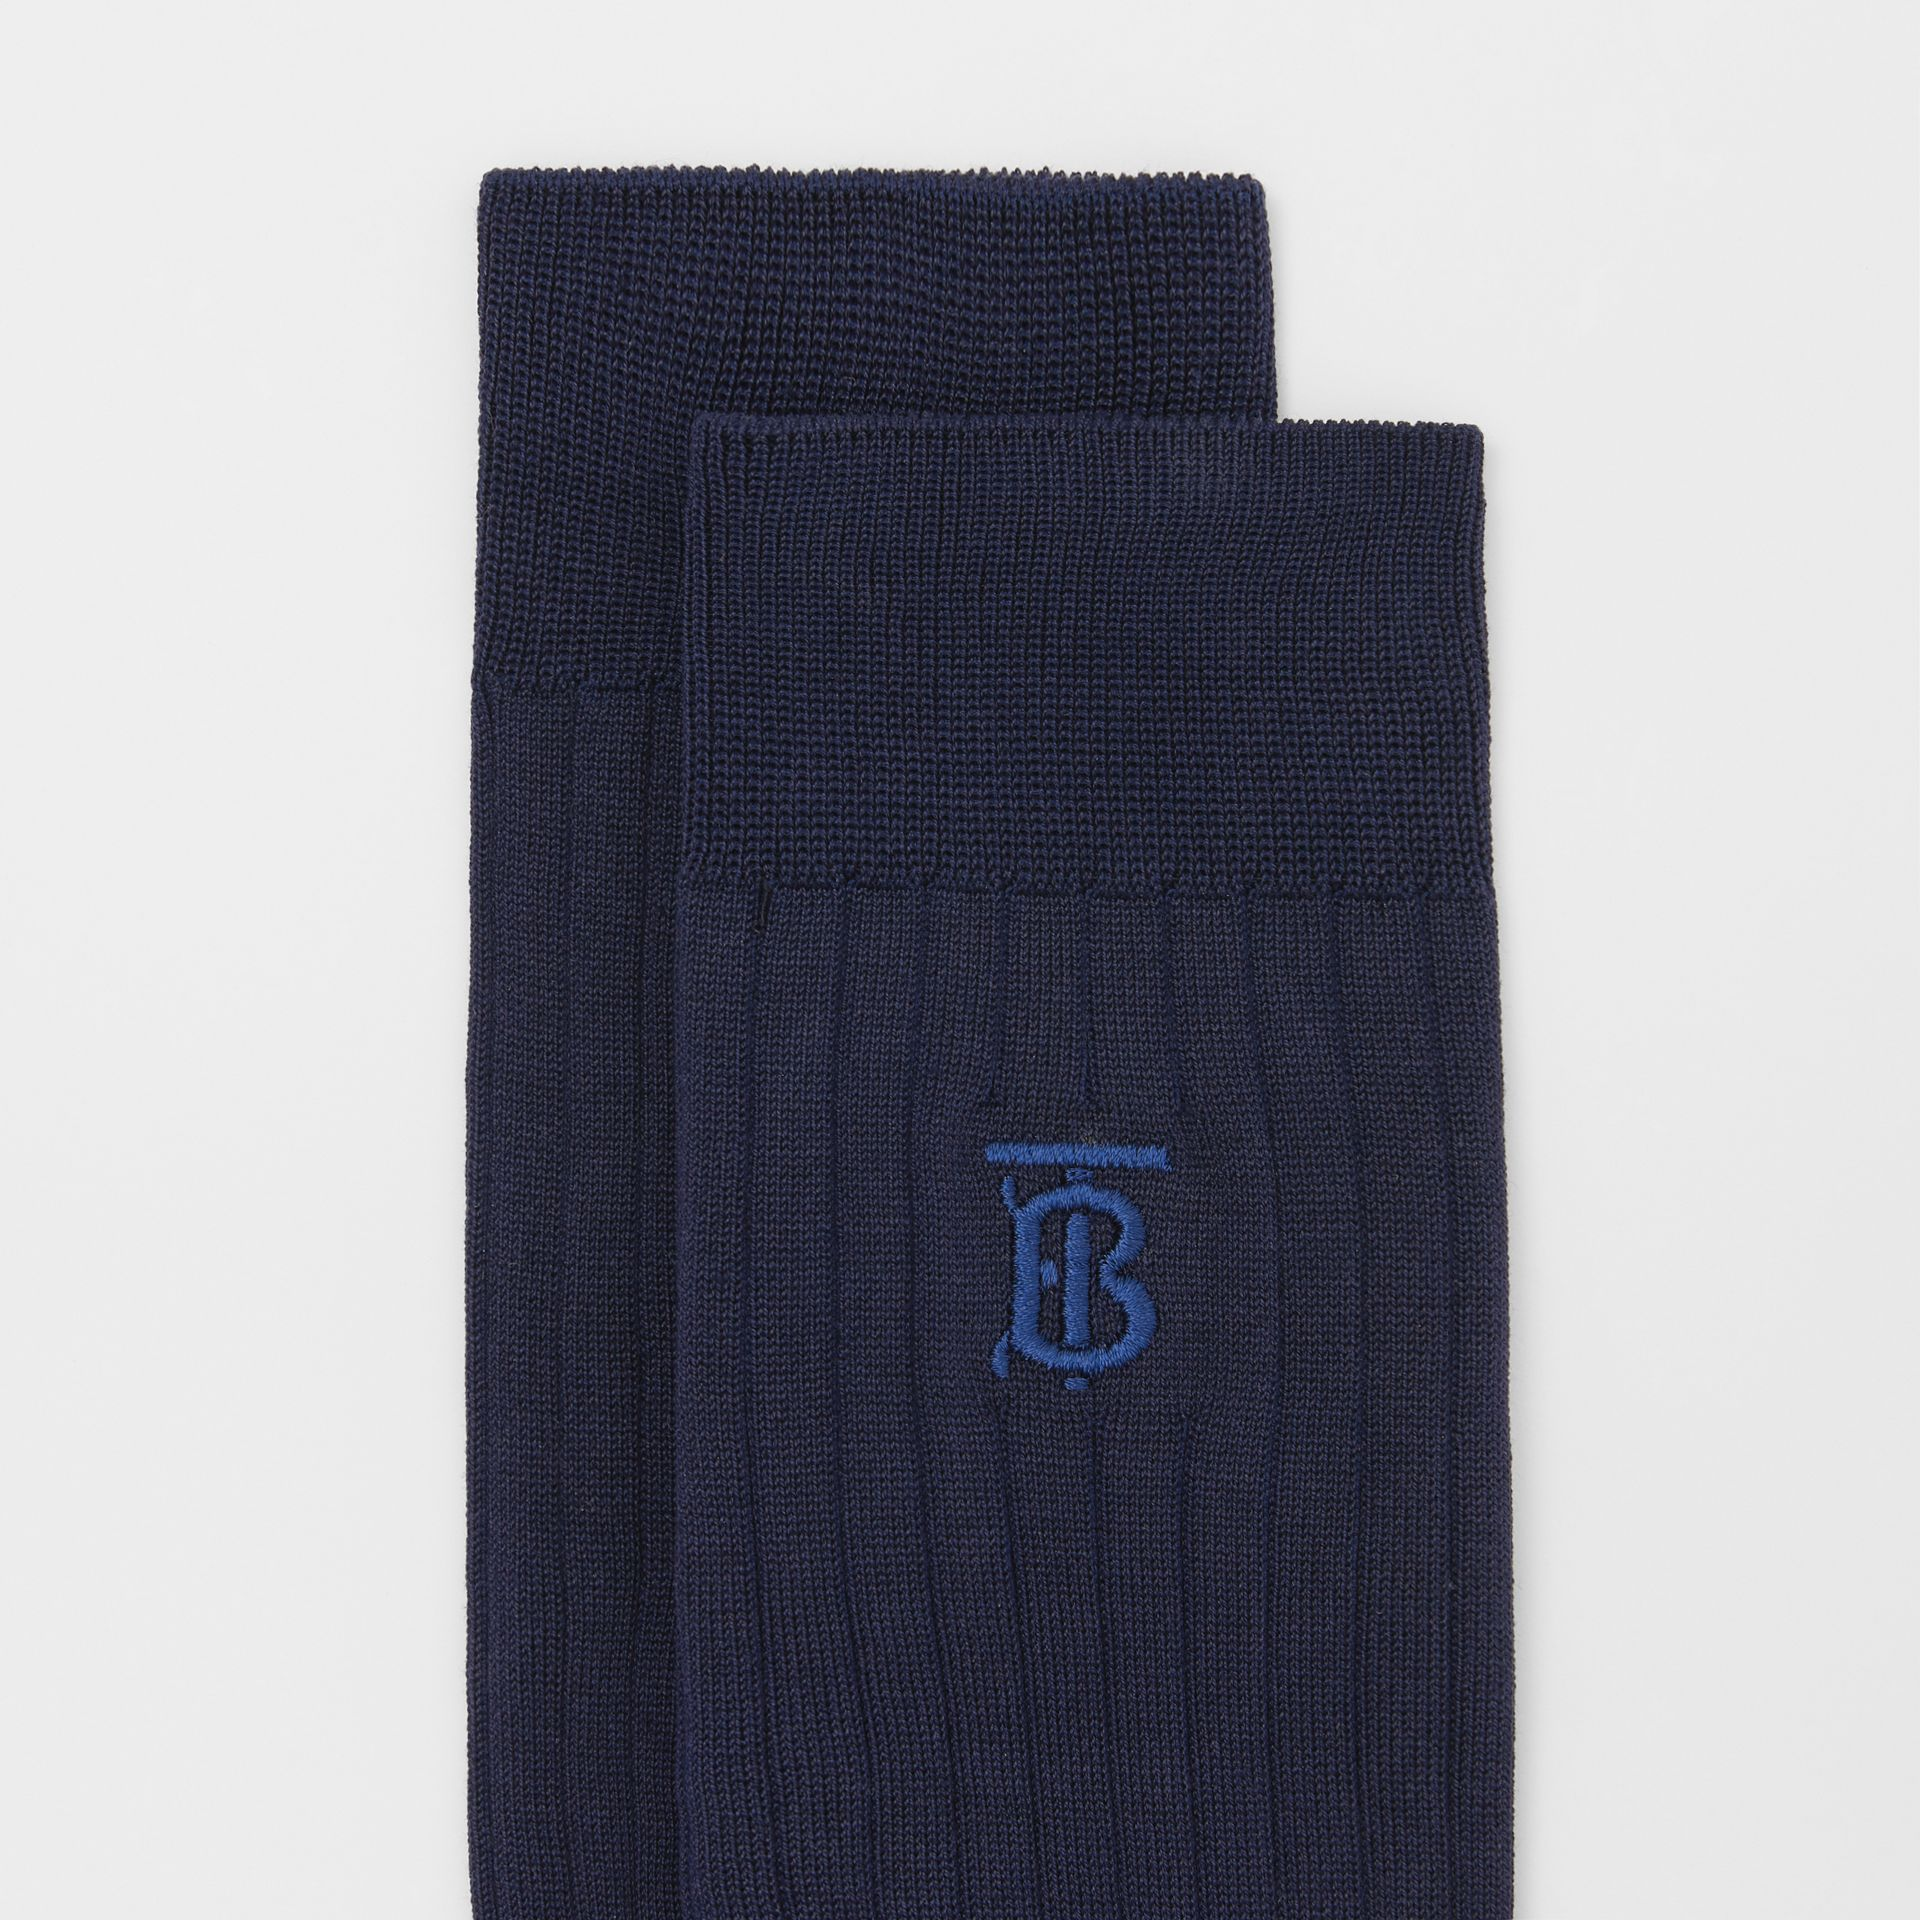 Monogram Motif Cotton Blend Socks in Navy | Burberry - gallery image 1